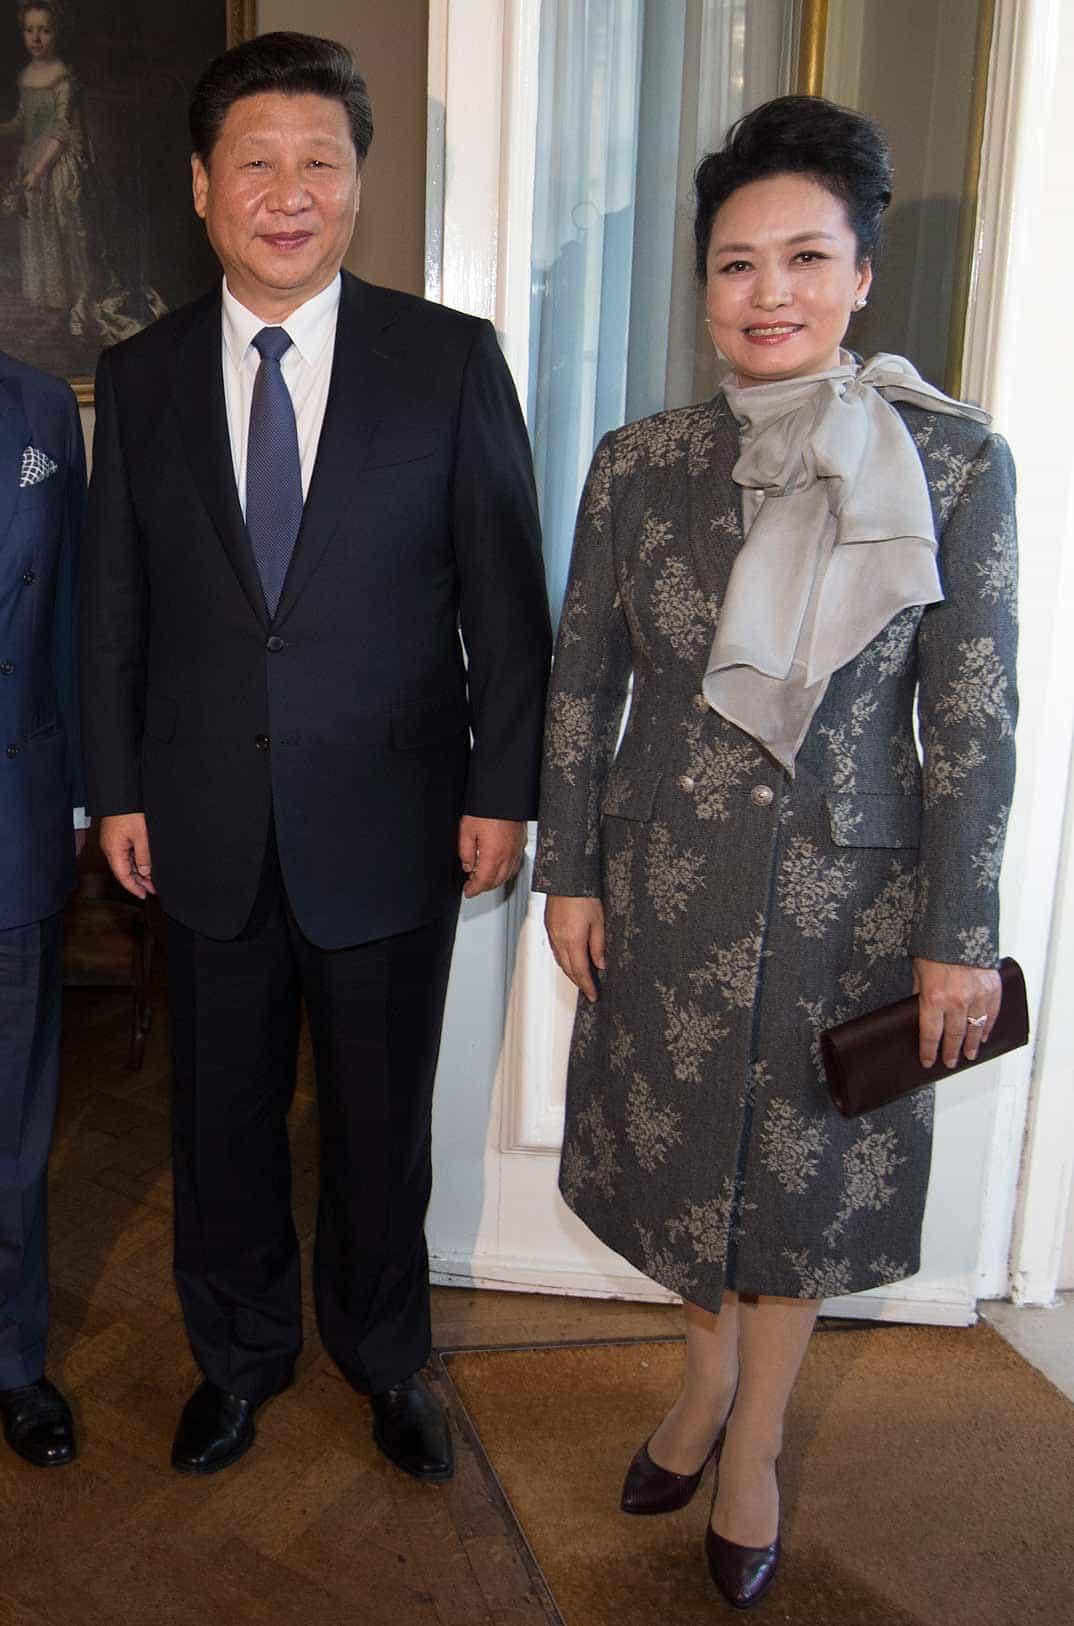 presidente-de-china-con-su-esposa